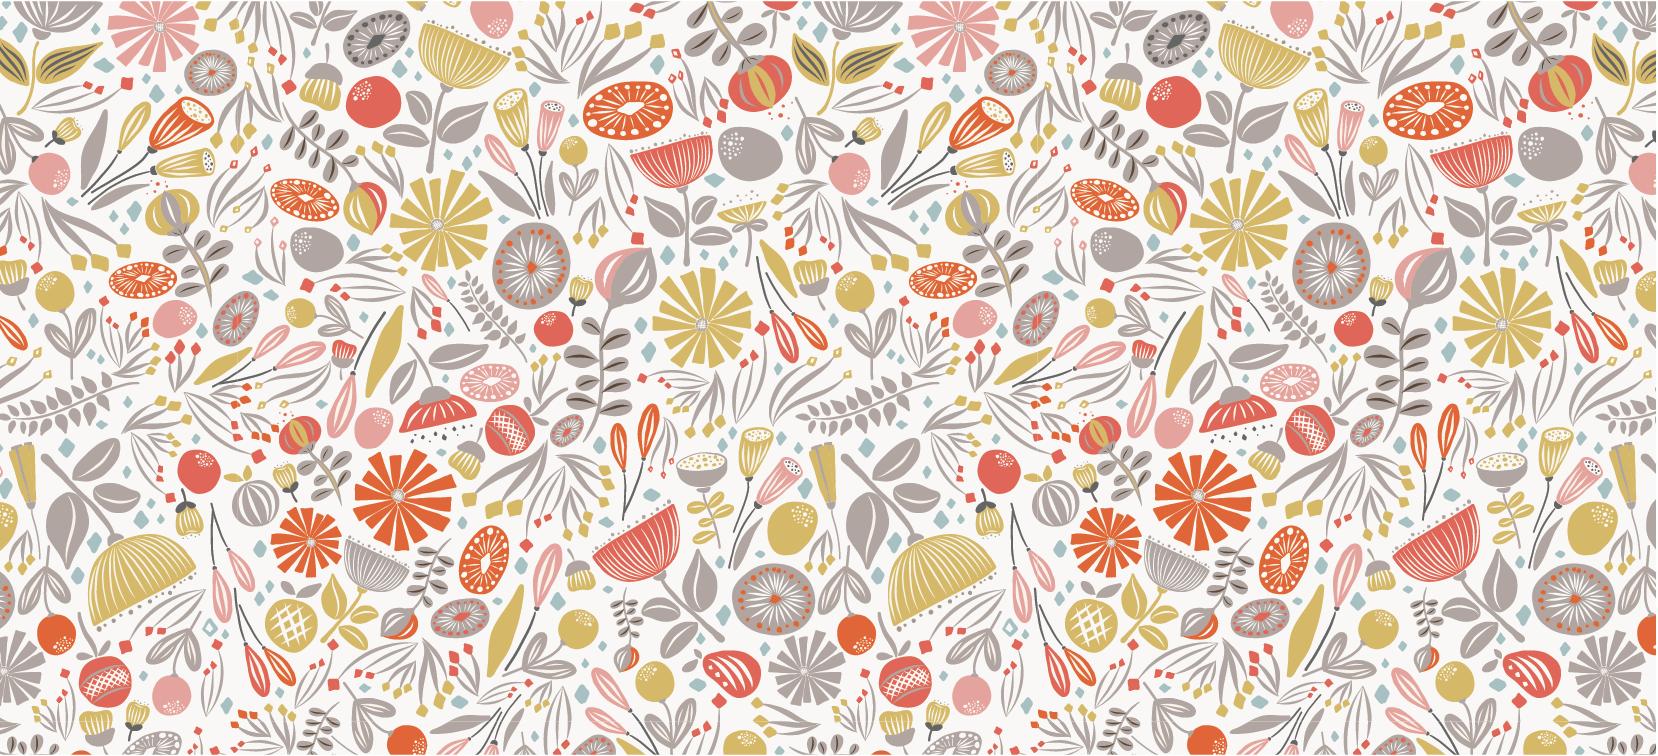 elena-wilken-whimsical-florals-surface-pattern-design1.png